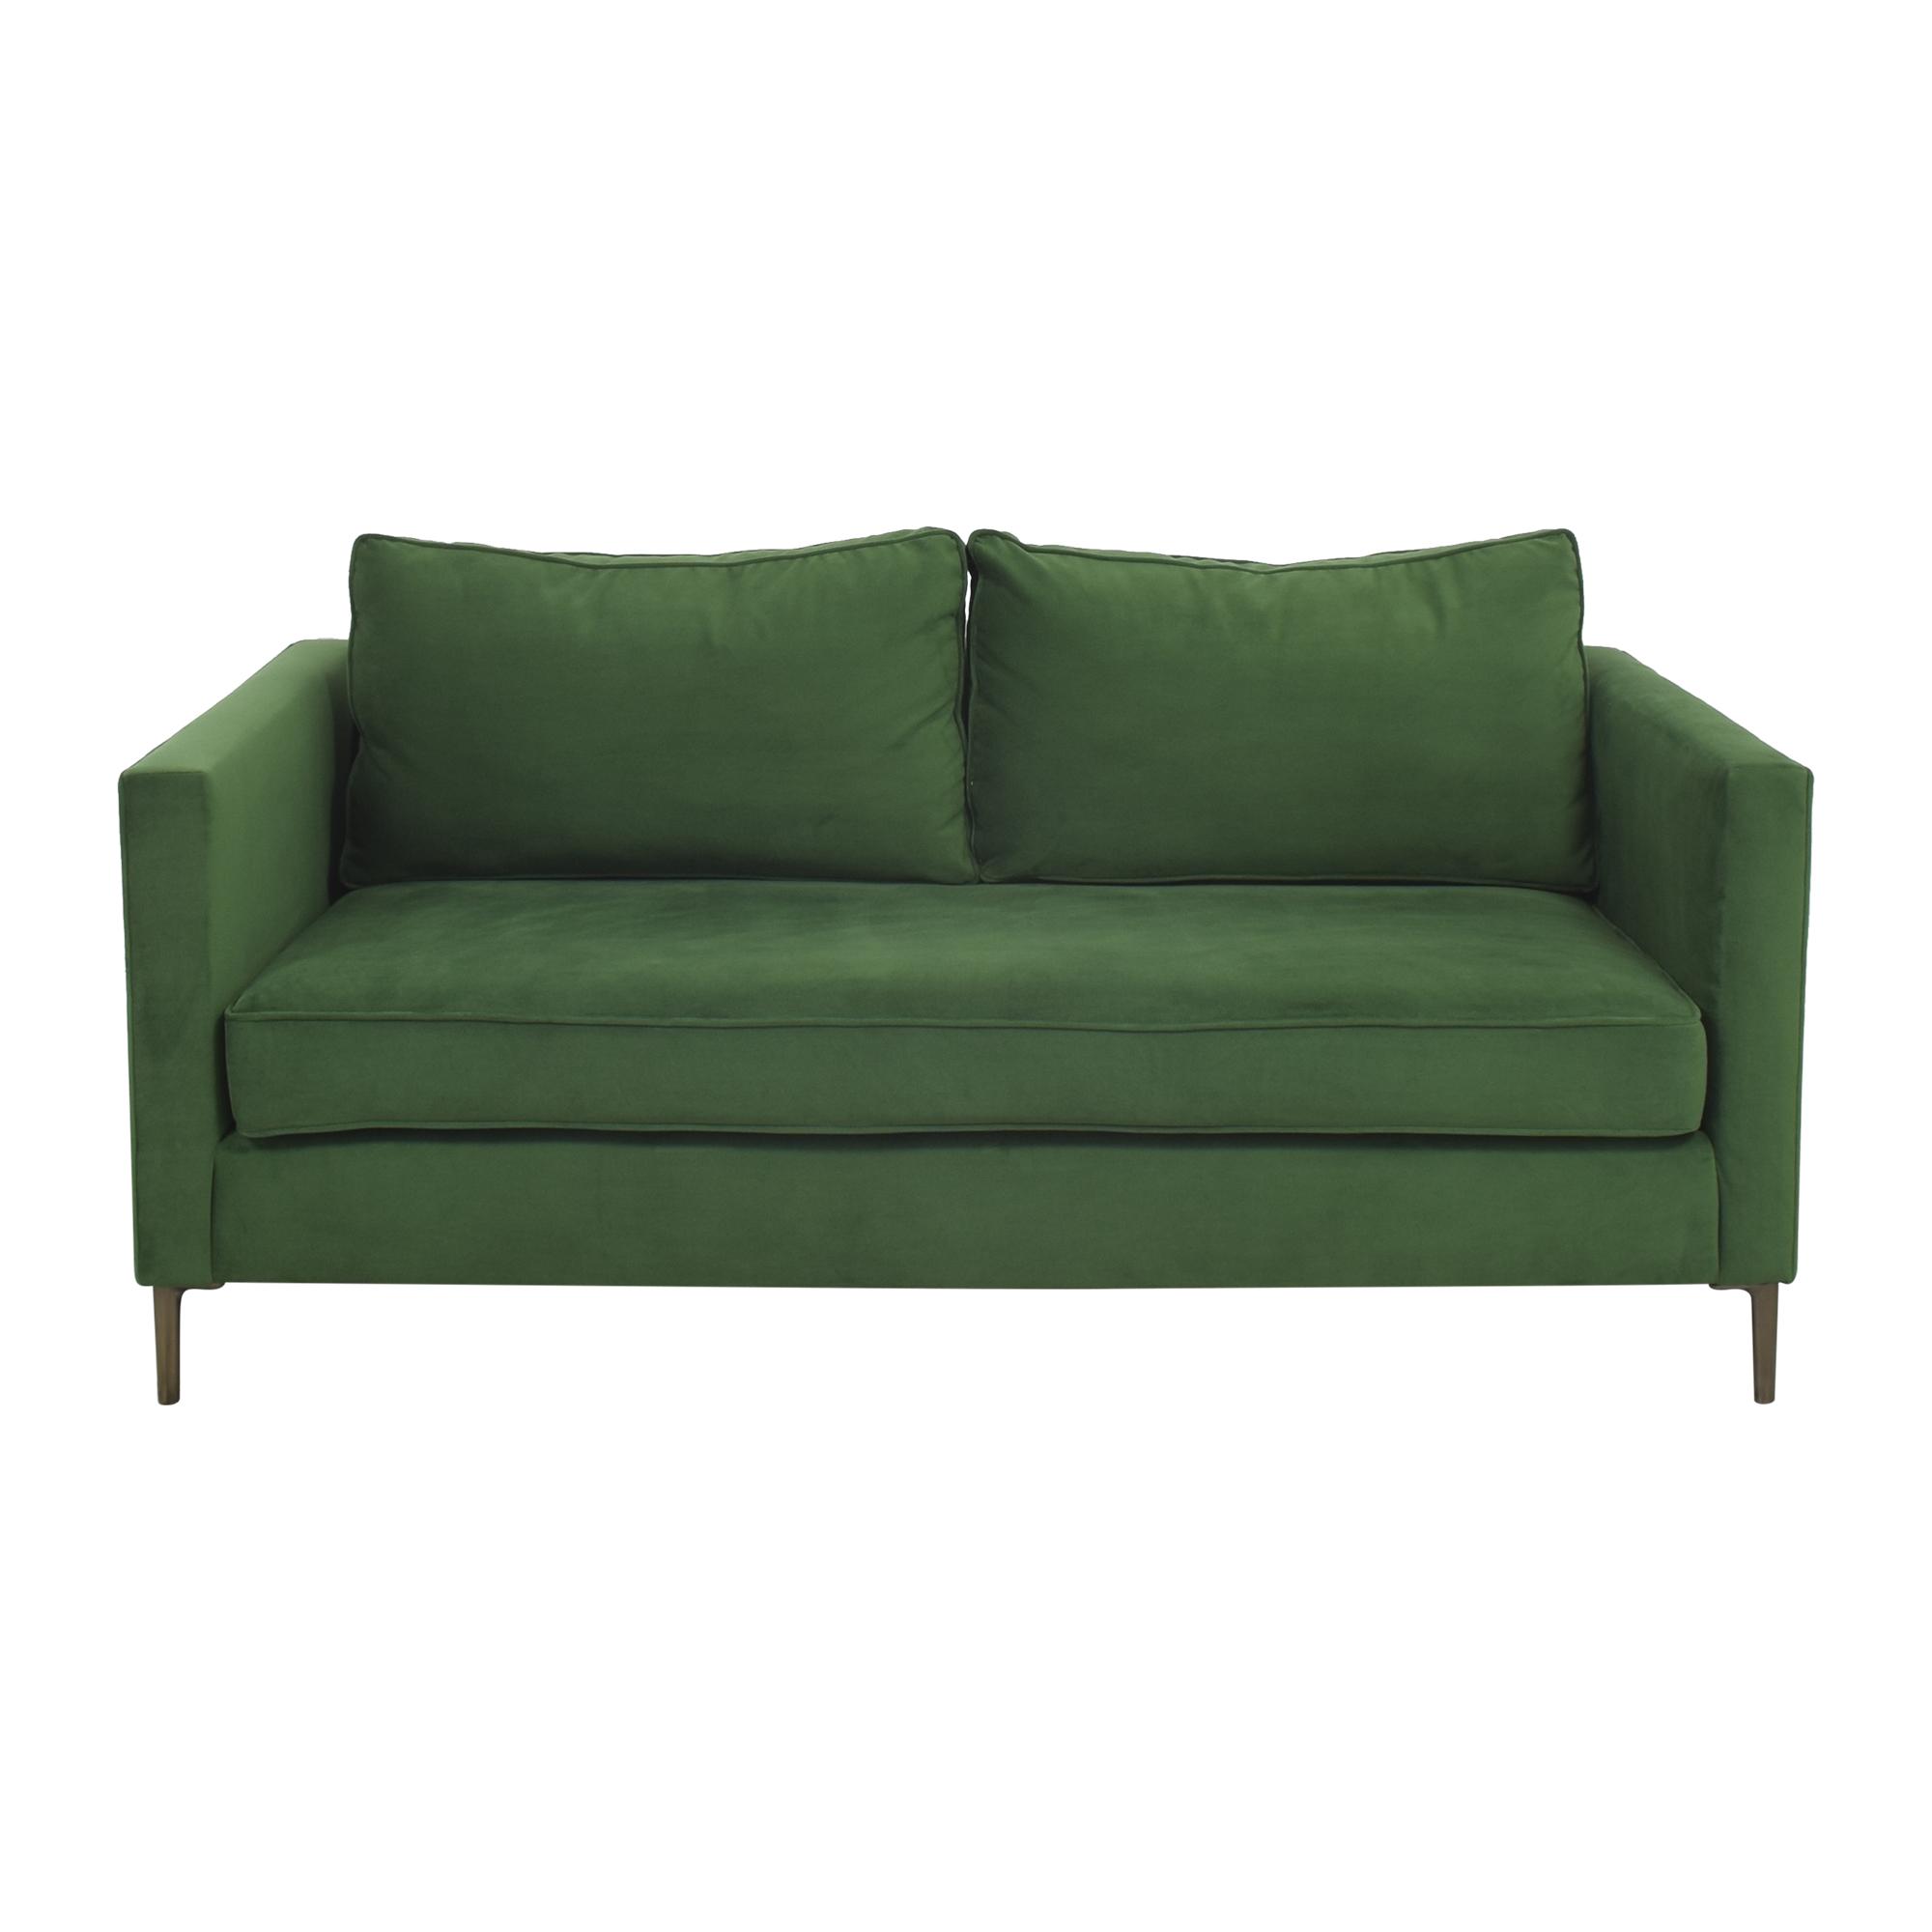 West Elm West Elm Harris Loft Sofa price